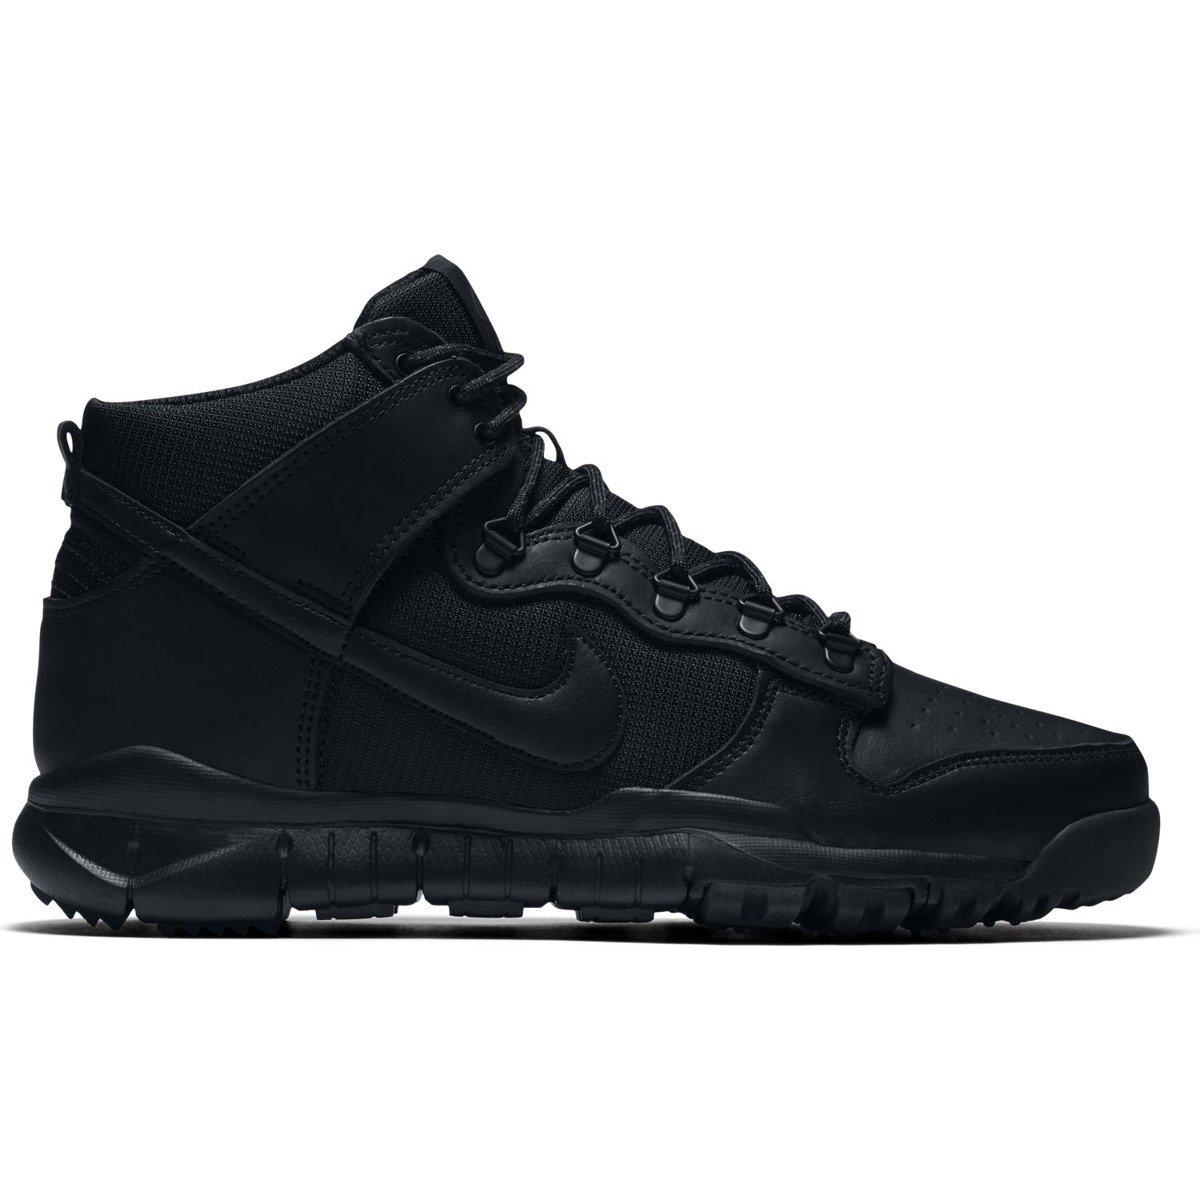 brand new 0d57e 5d0df Miniramp Skateshop buty nike sb dunk high bota skateboarding shoe black  black